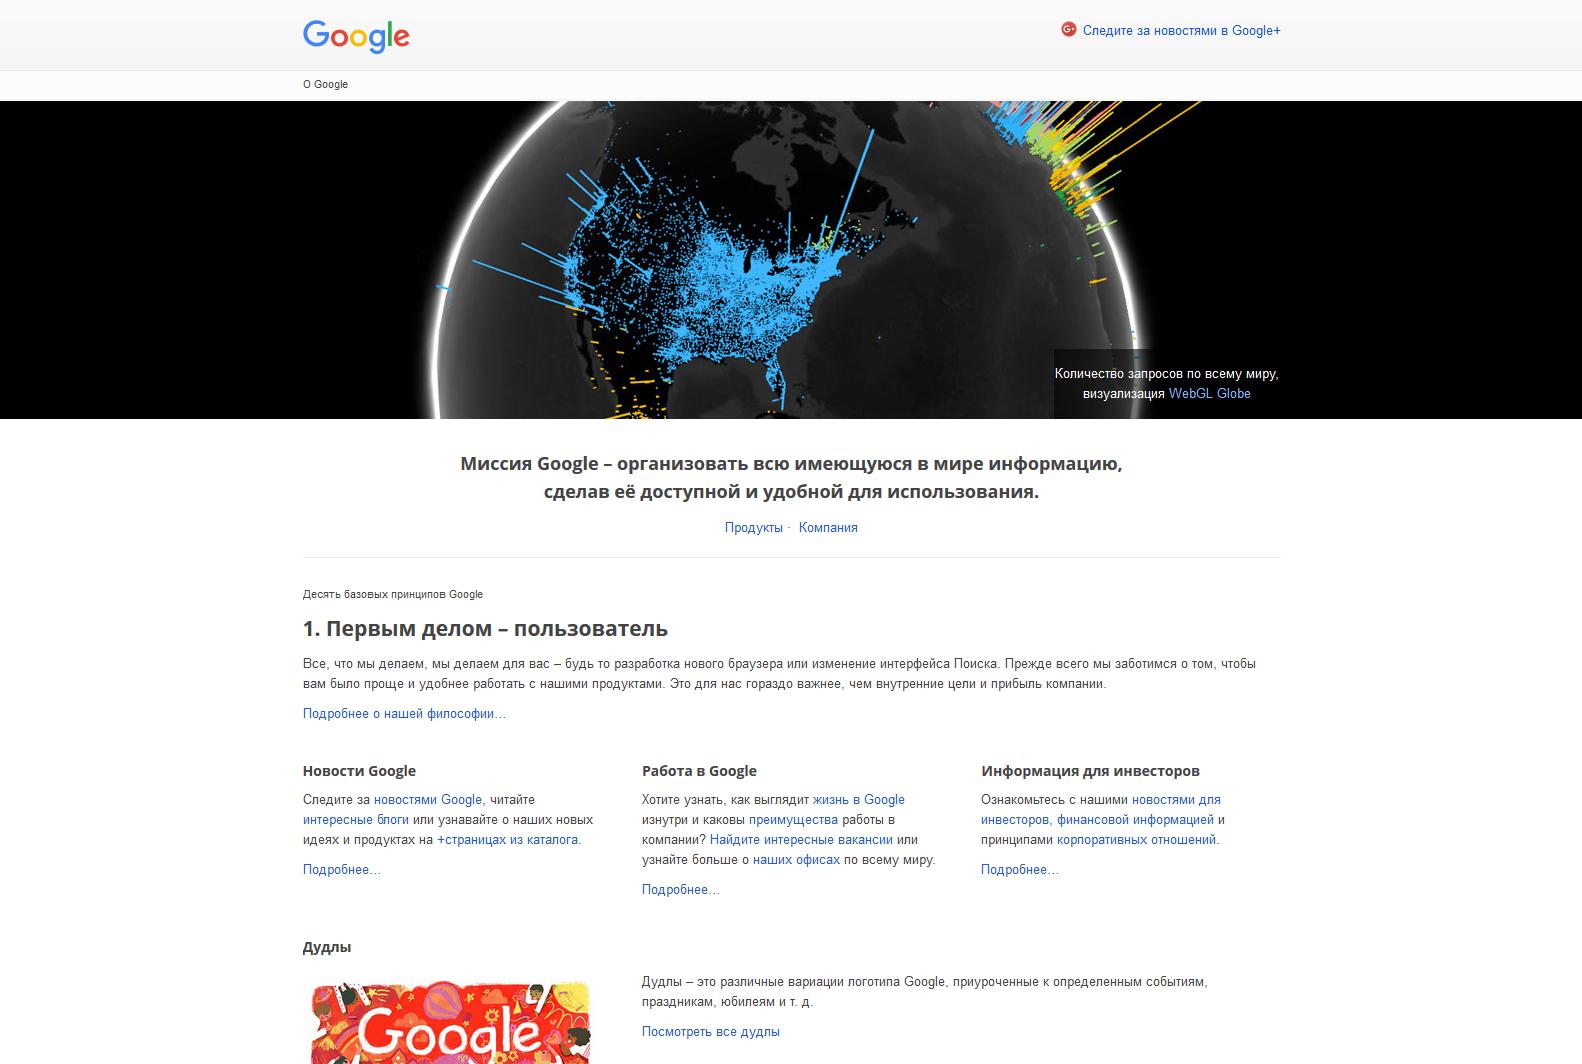 презентационная страница Google